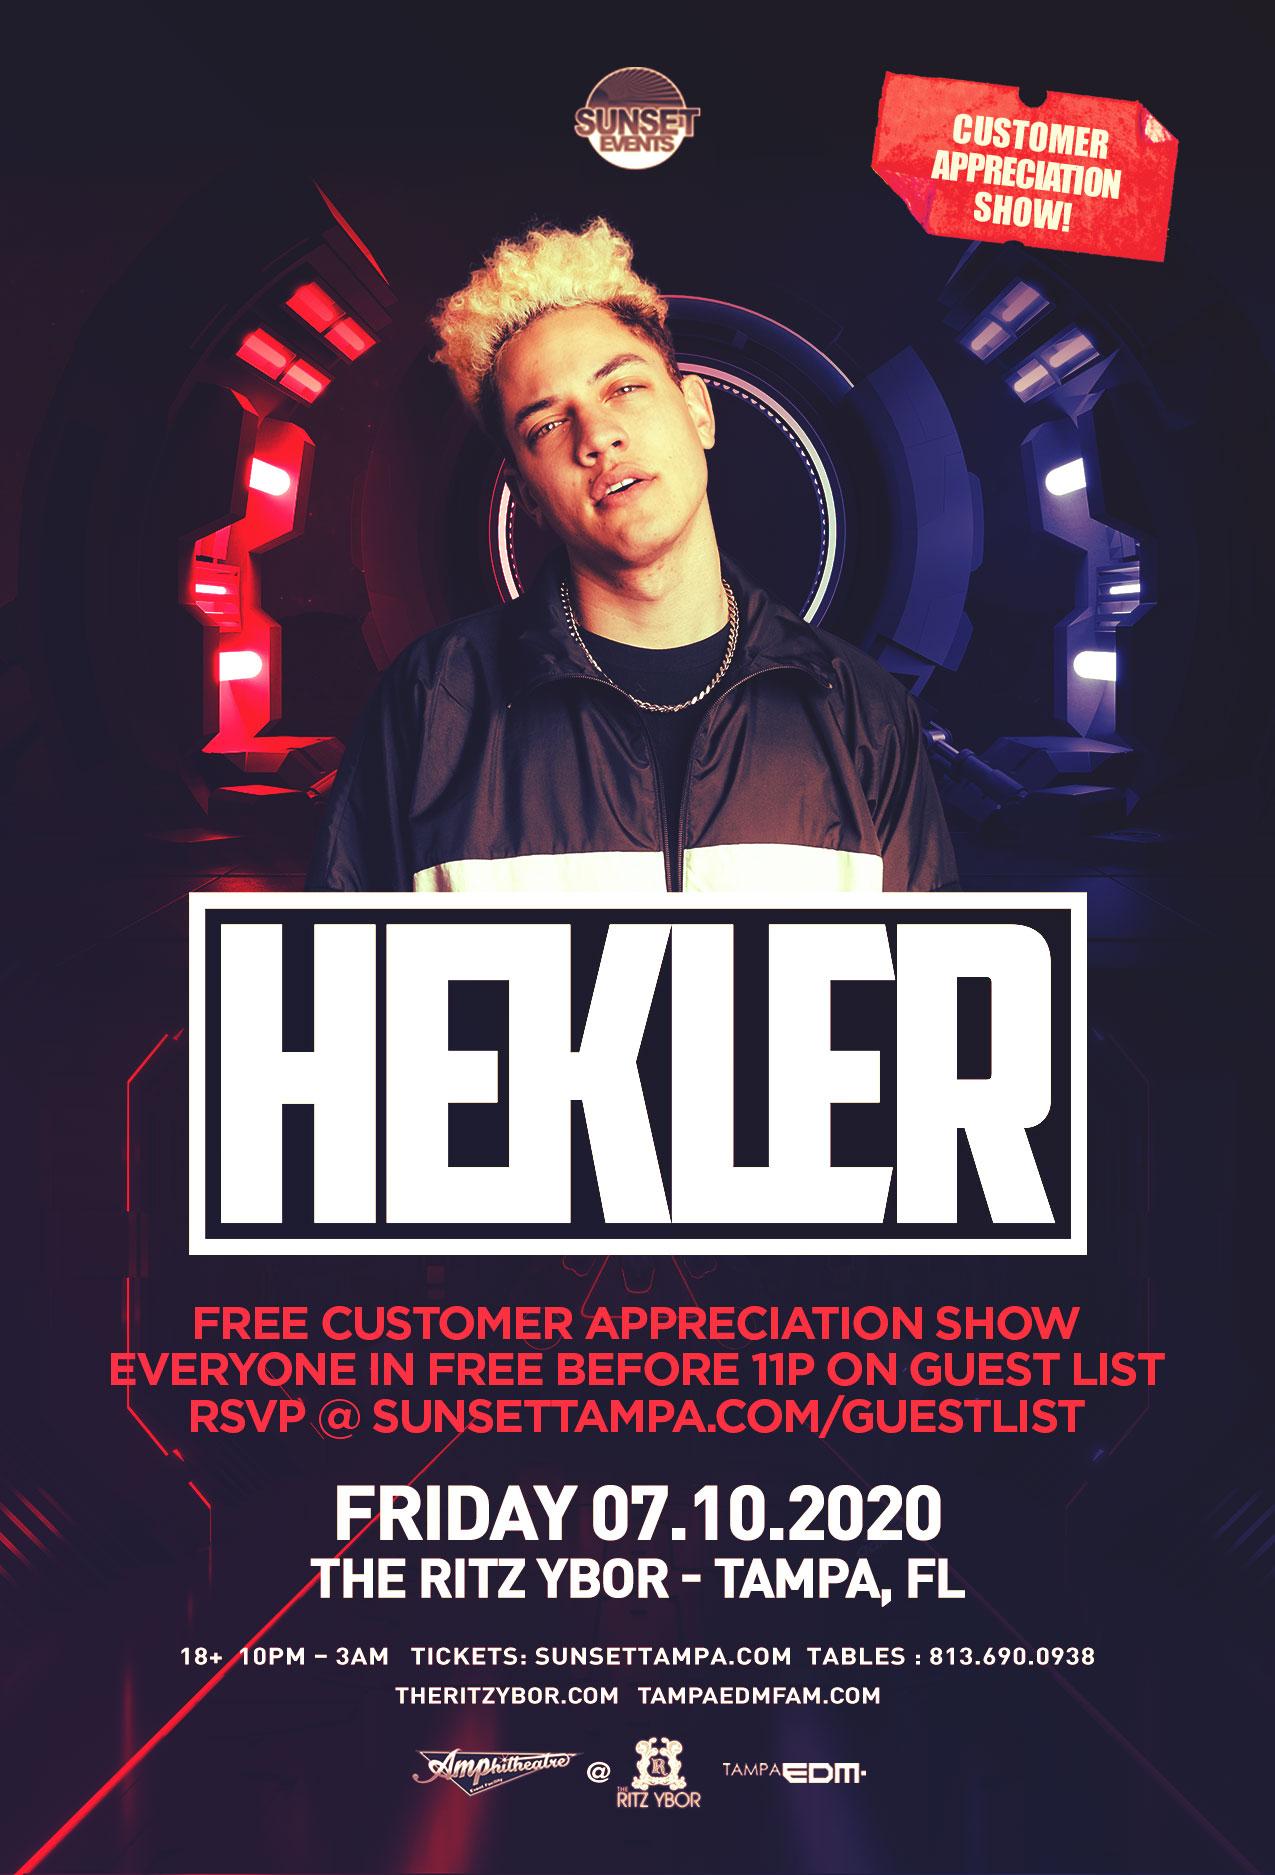 Tampa Bay Sunset Smile Halloween 2020 HEKLER   #POUND Fridays at The RITZ Ybor   7/10/2020   Sunset